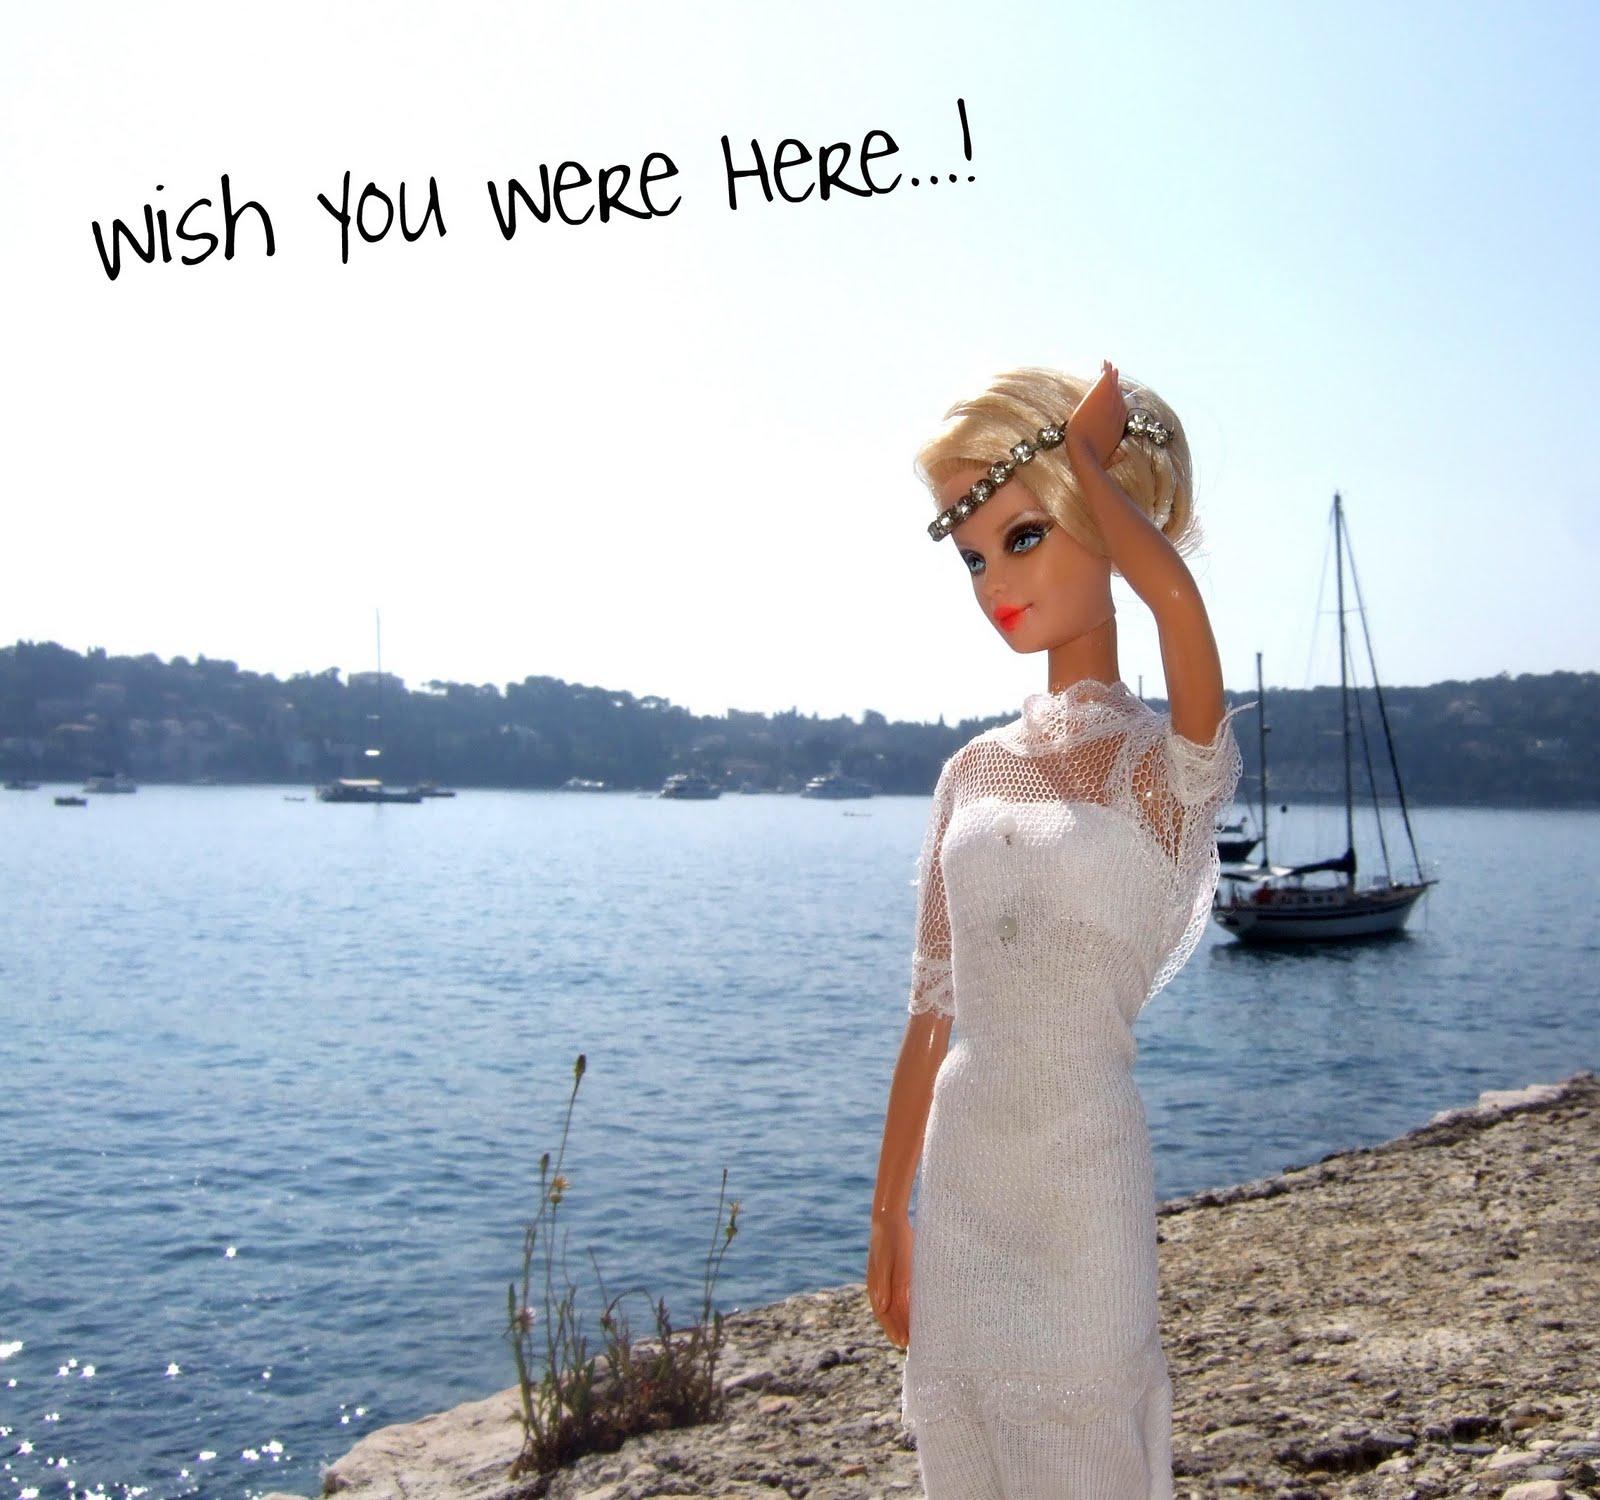 http://4.bp.blogspot.com/-Deslo5pE2M4/Tjlb5MDZ0hI/AAAAAAAAAWM/KL6uZVQ9I40/s1600/style-icon-barbie-of-the-day.jpg